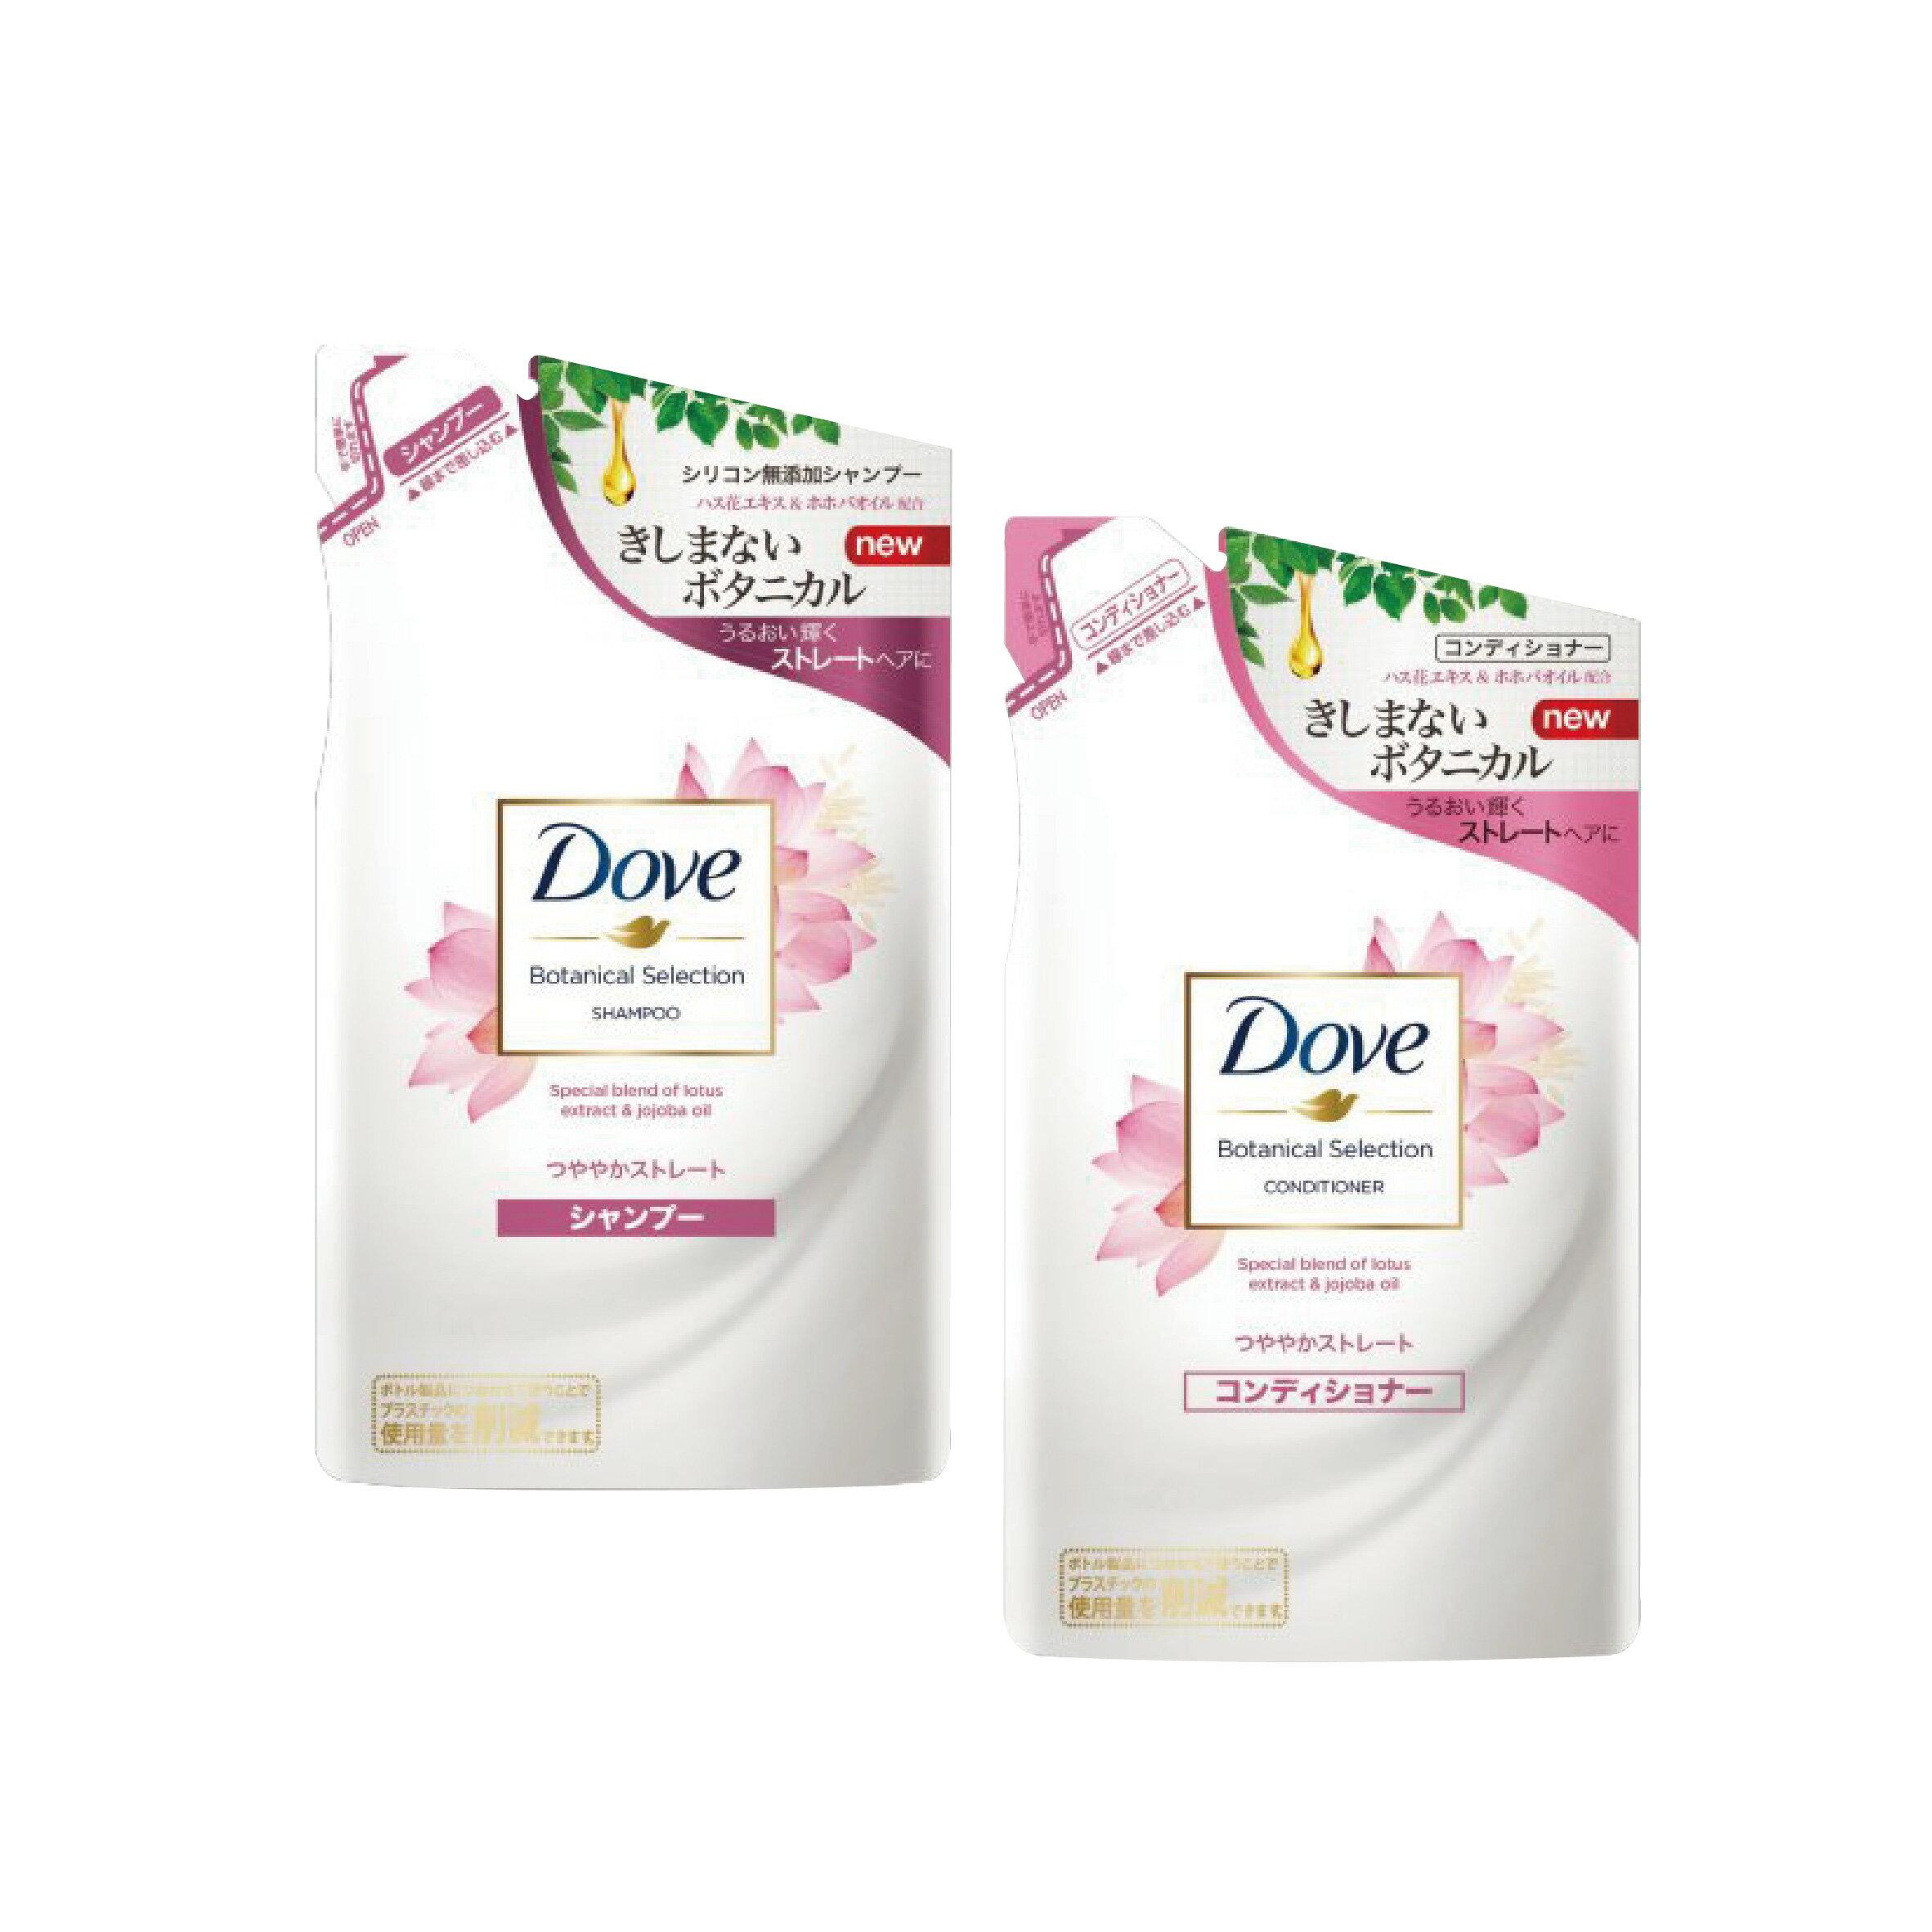 Dove多芬植萃洗潤補充包 柔順保濕洗潤荷花精萃350g(1+1)